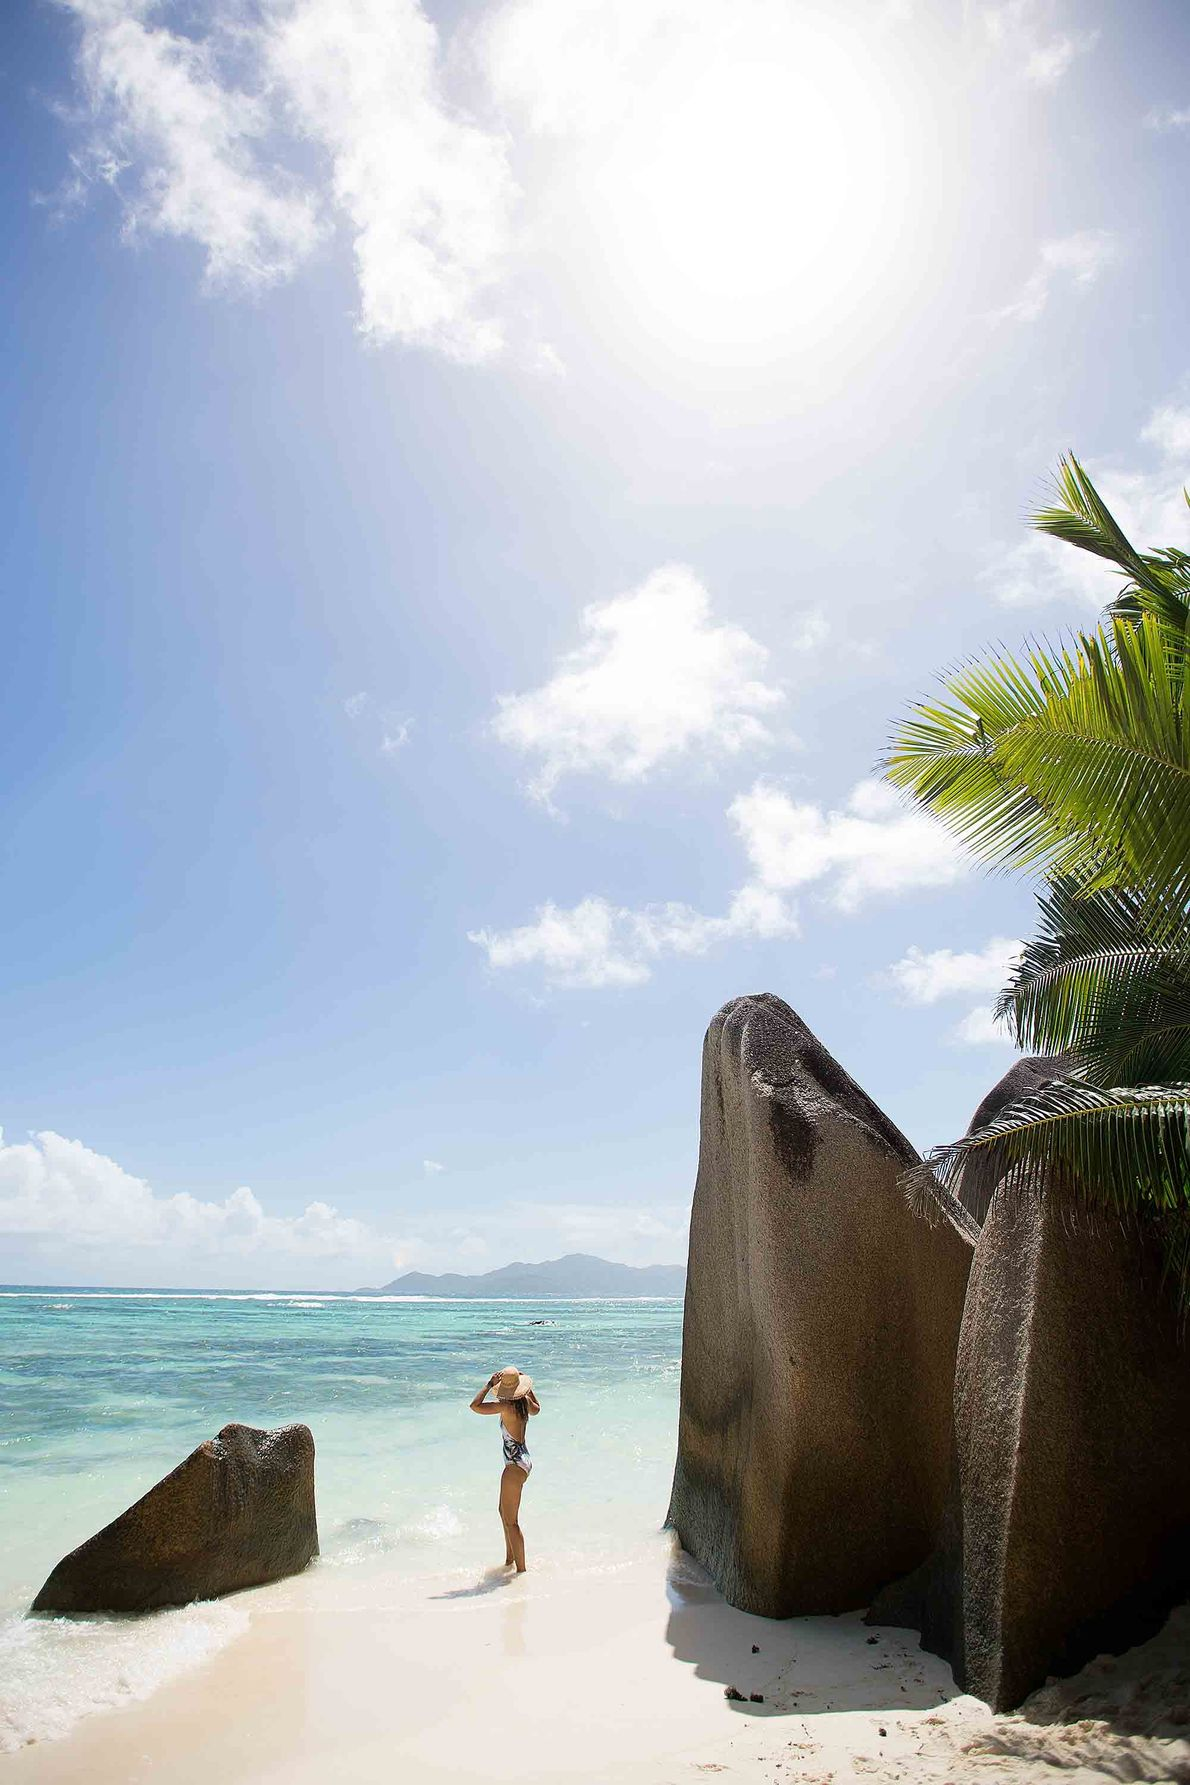 Imagen de una mujer en la playa de Anse Source d'Argent en La Digue, Seychelles